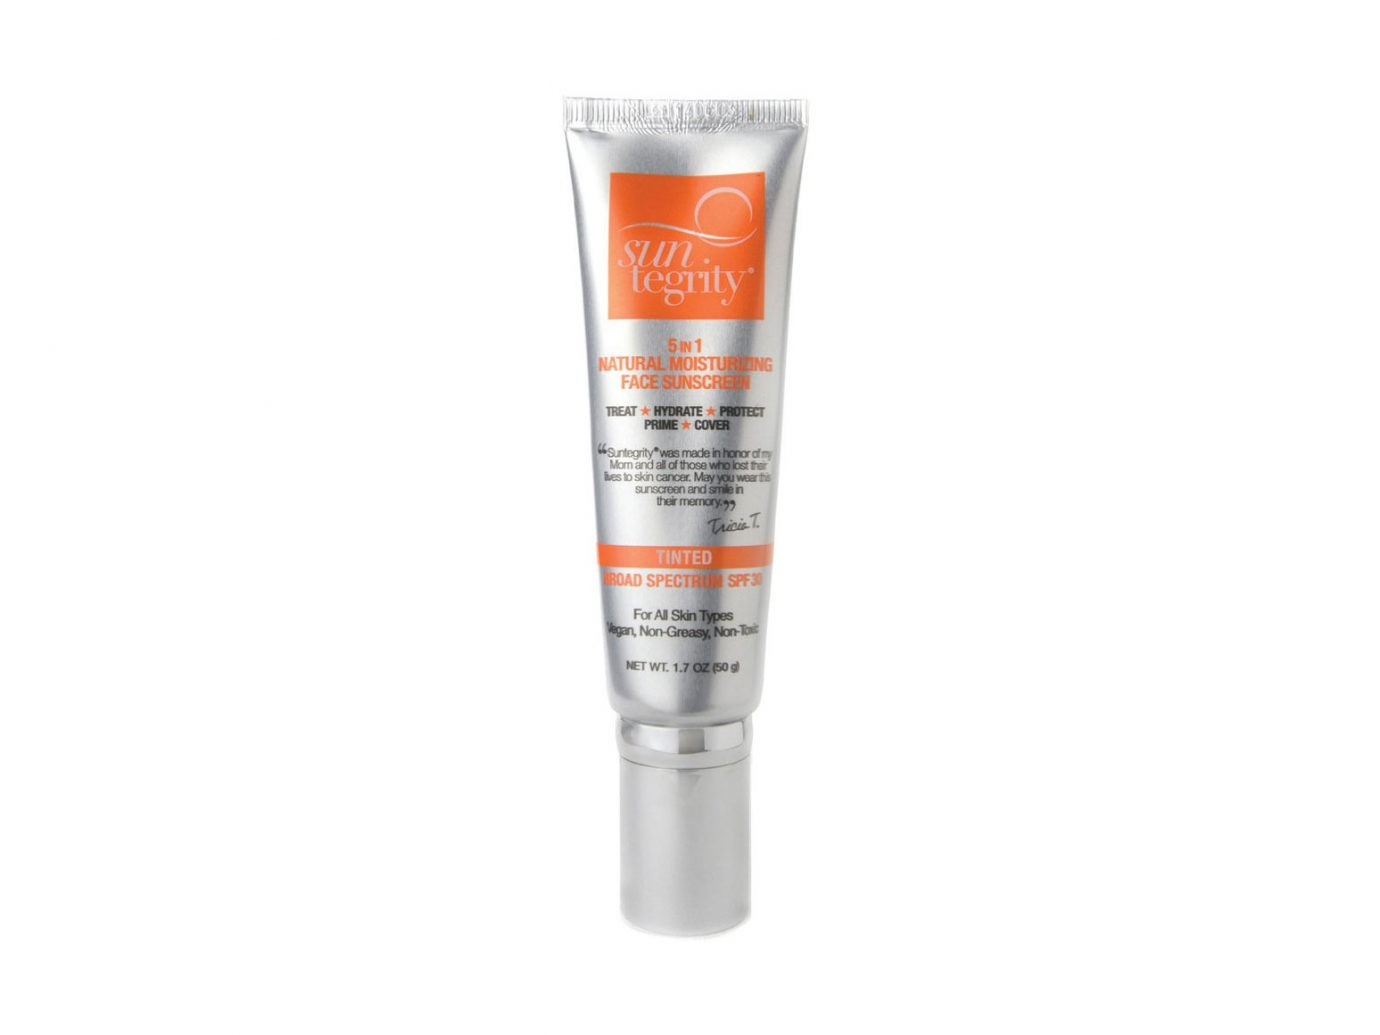 Suntegrity Skincare 5 in 1 Natural Moisturizing Face Sunscreen SPF 30